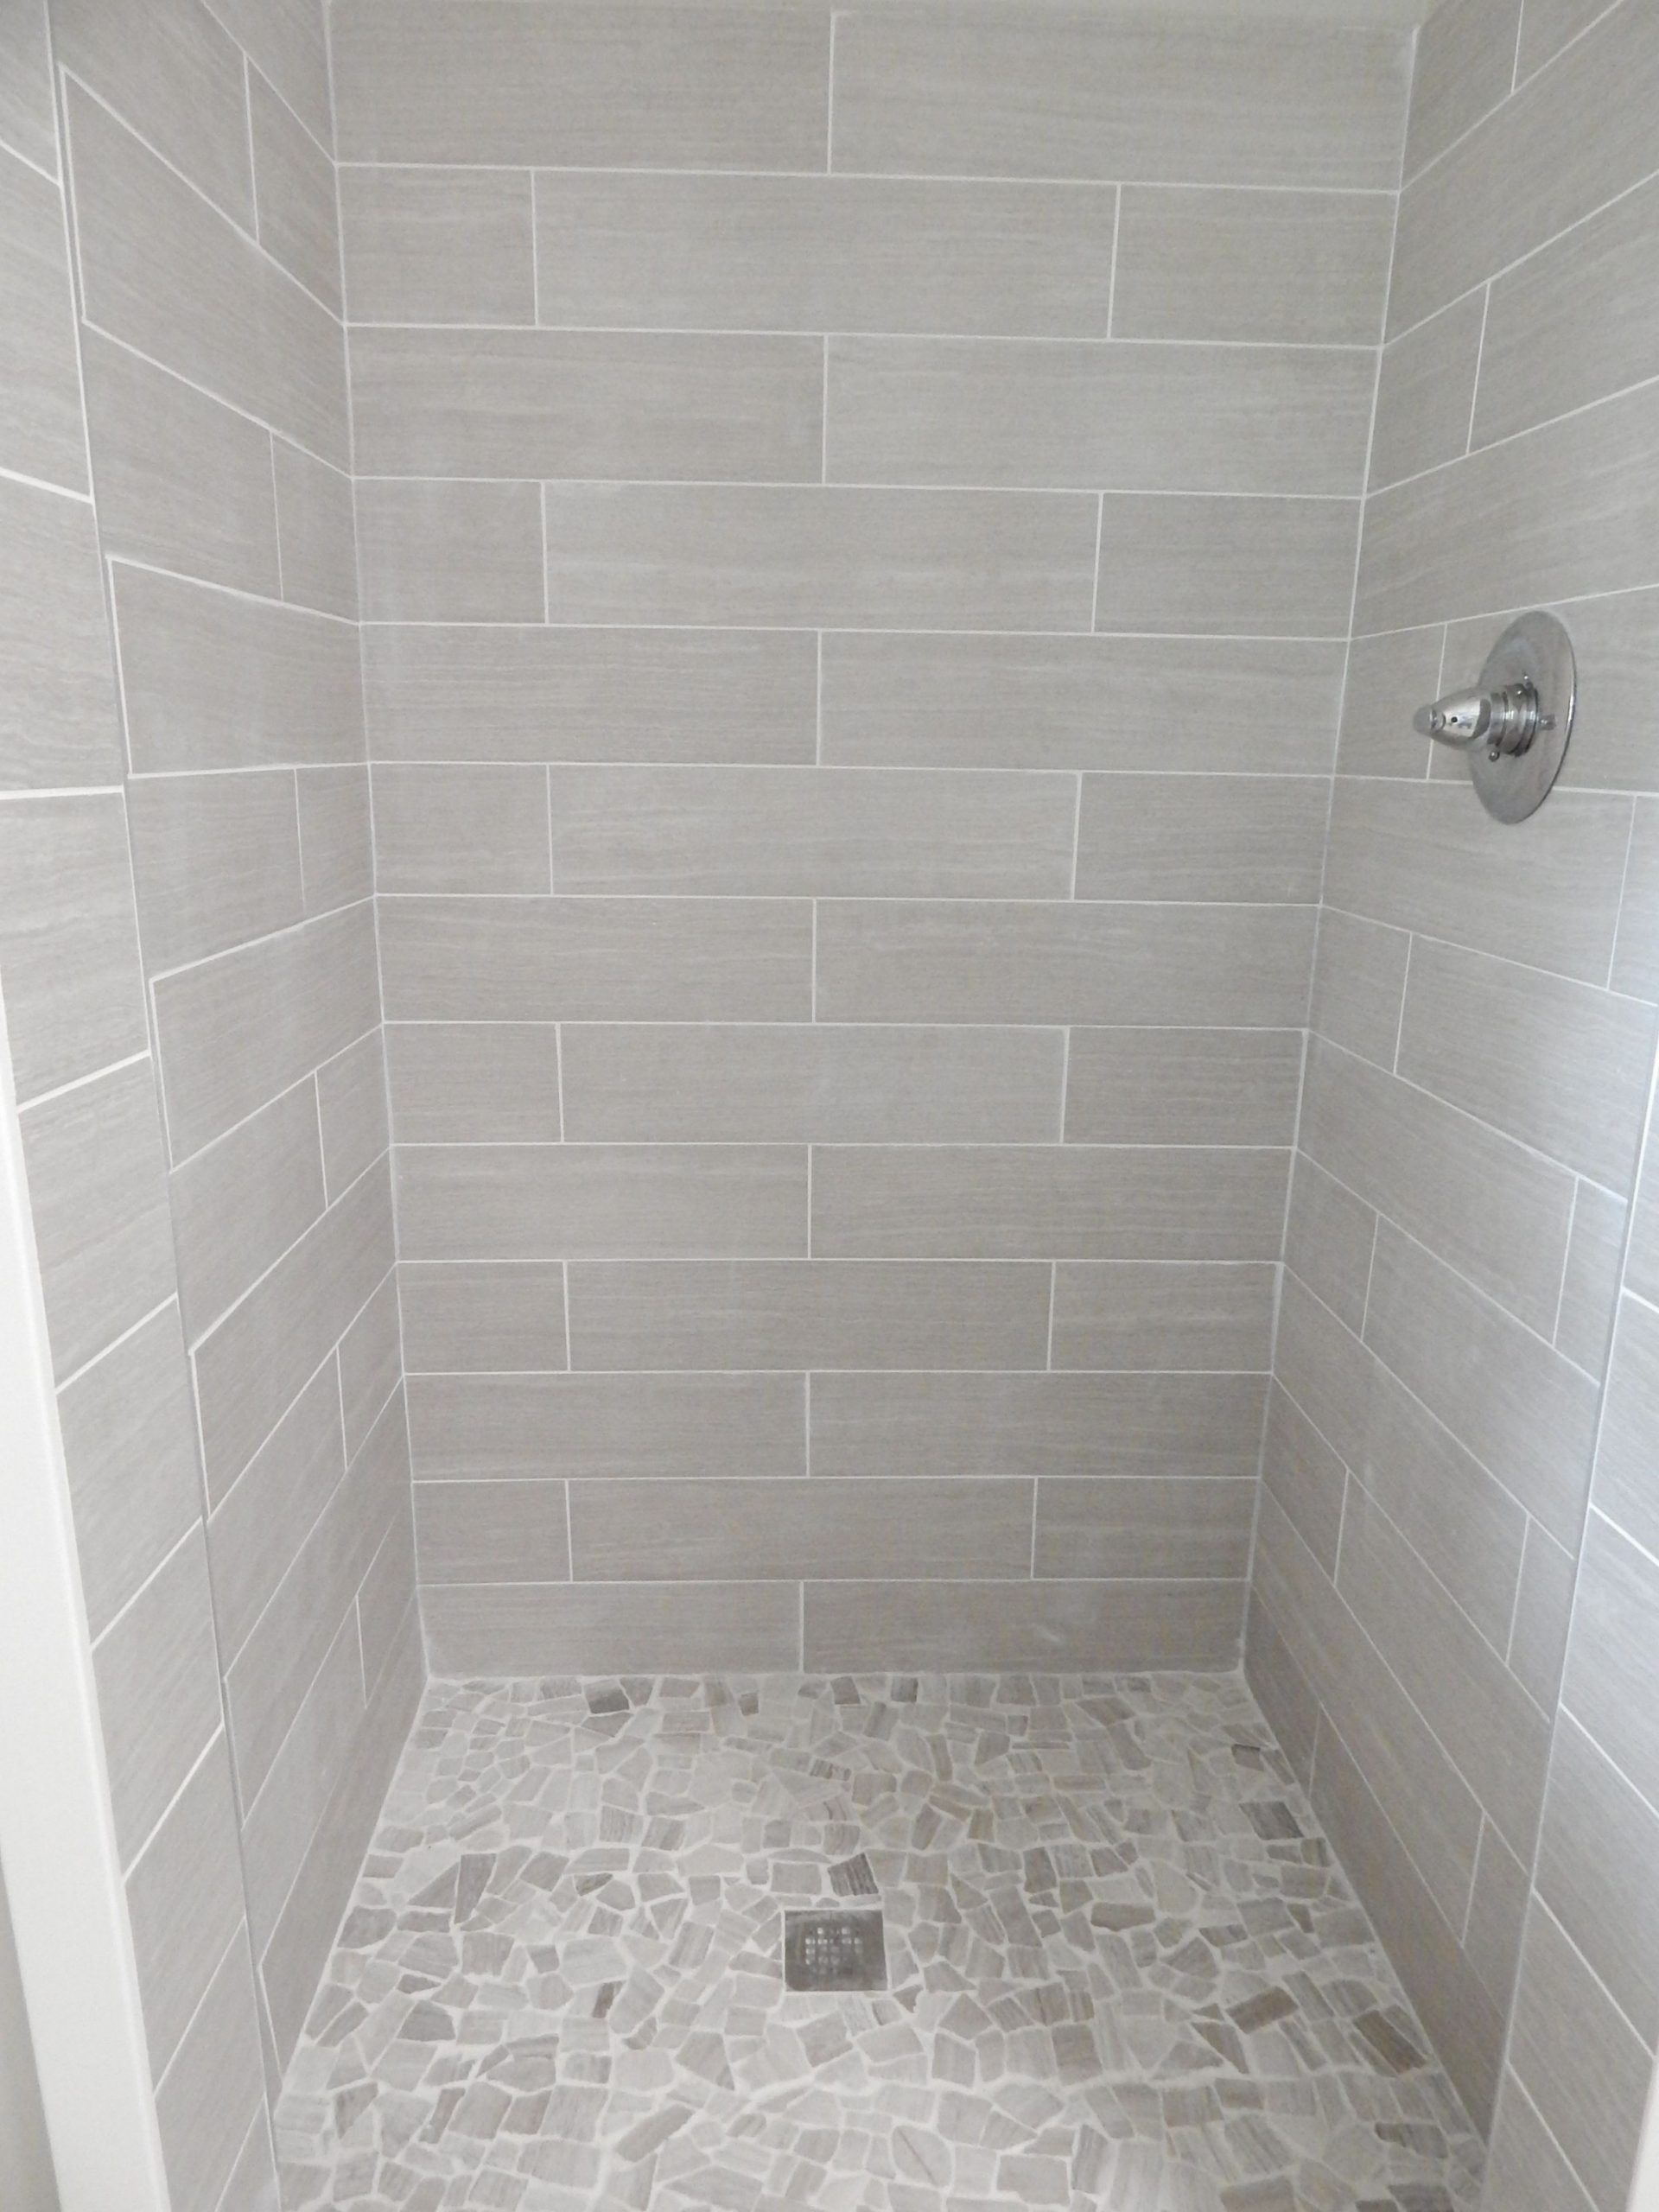 Lowes Bathroom Tiles Ideas In 2020 Bathroom Shower Tile Gray Shower Tile Shower Tile